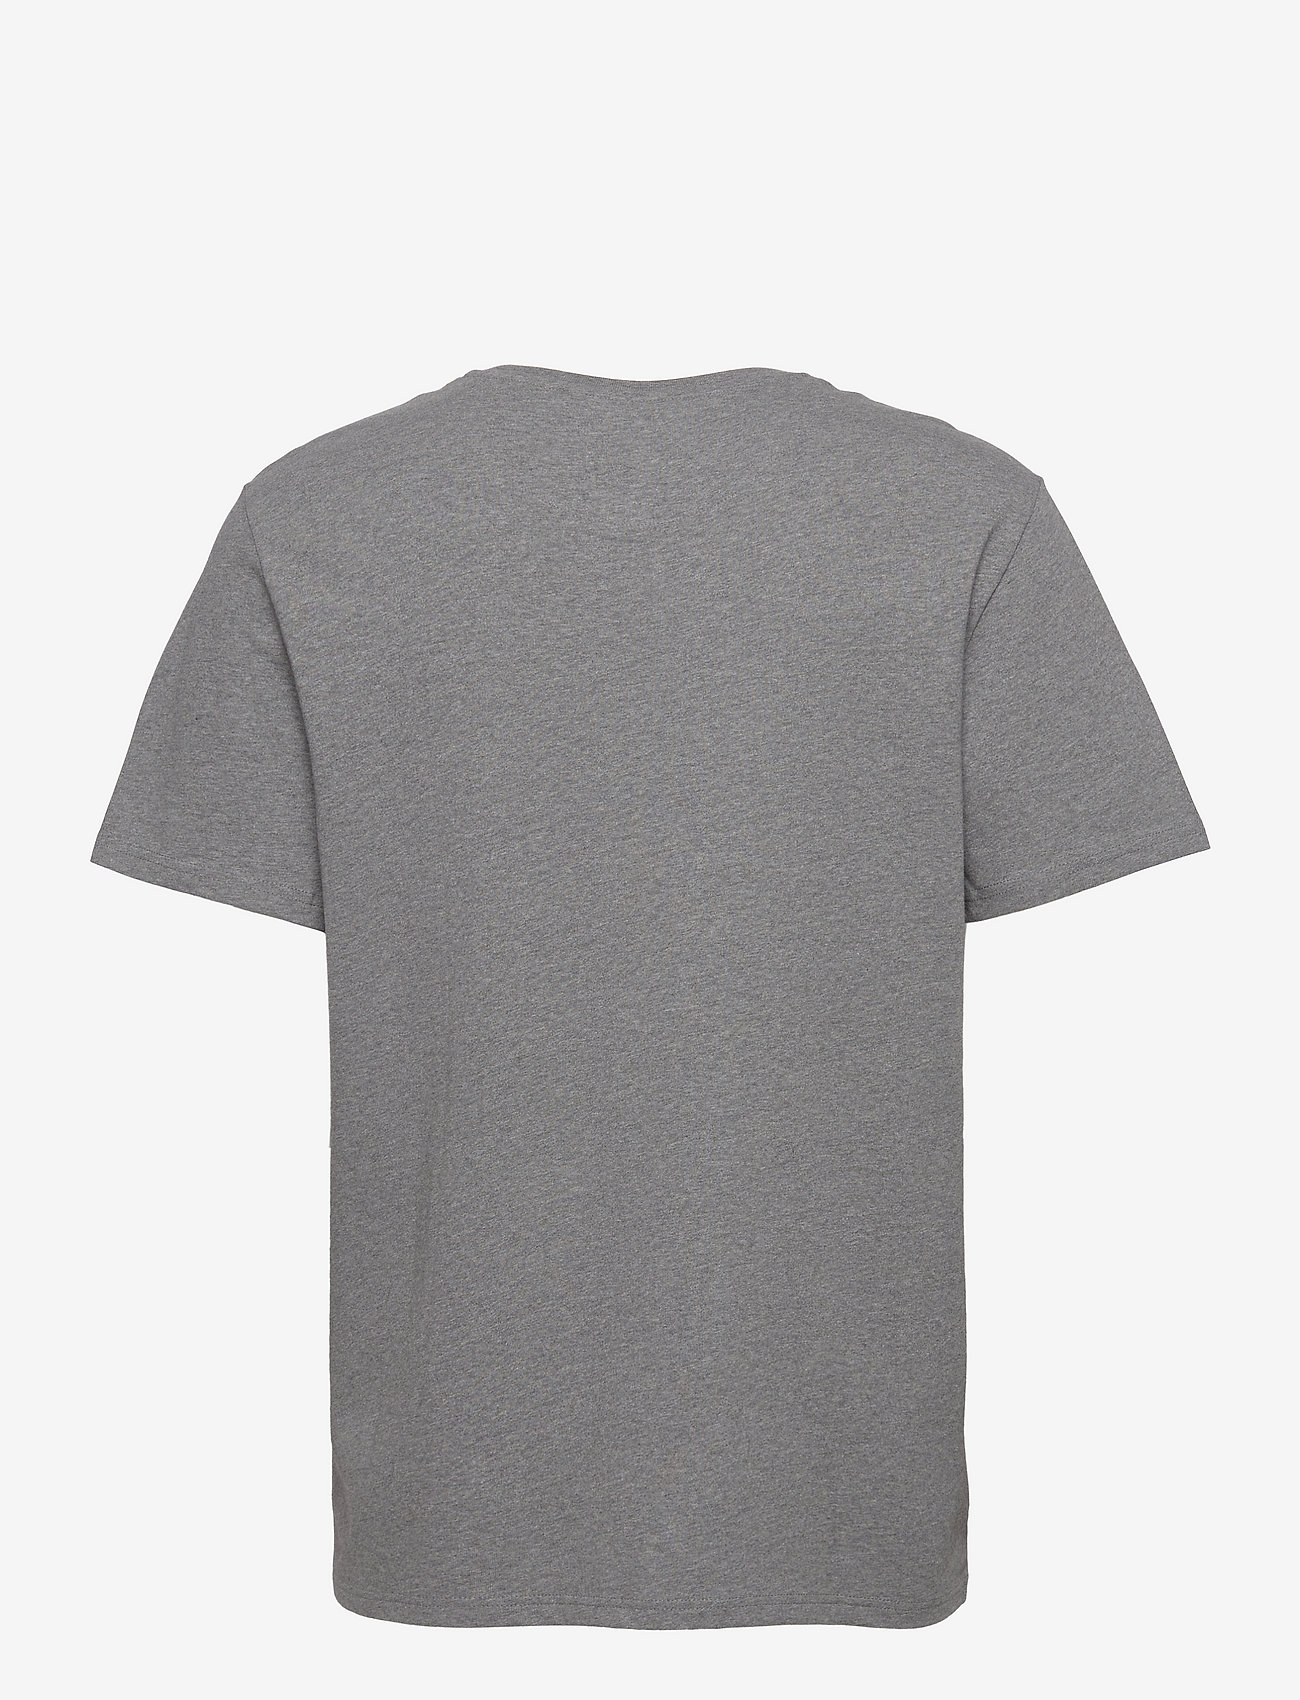 Lyle & Scott - Plain T-Shirt - podstawowe koszulki - mid grey marl - 1